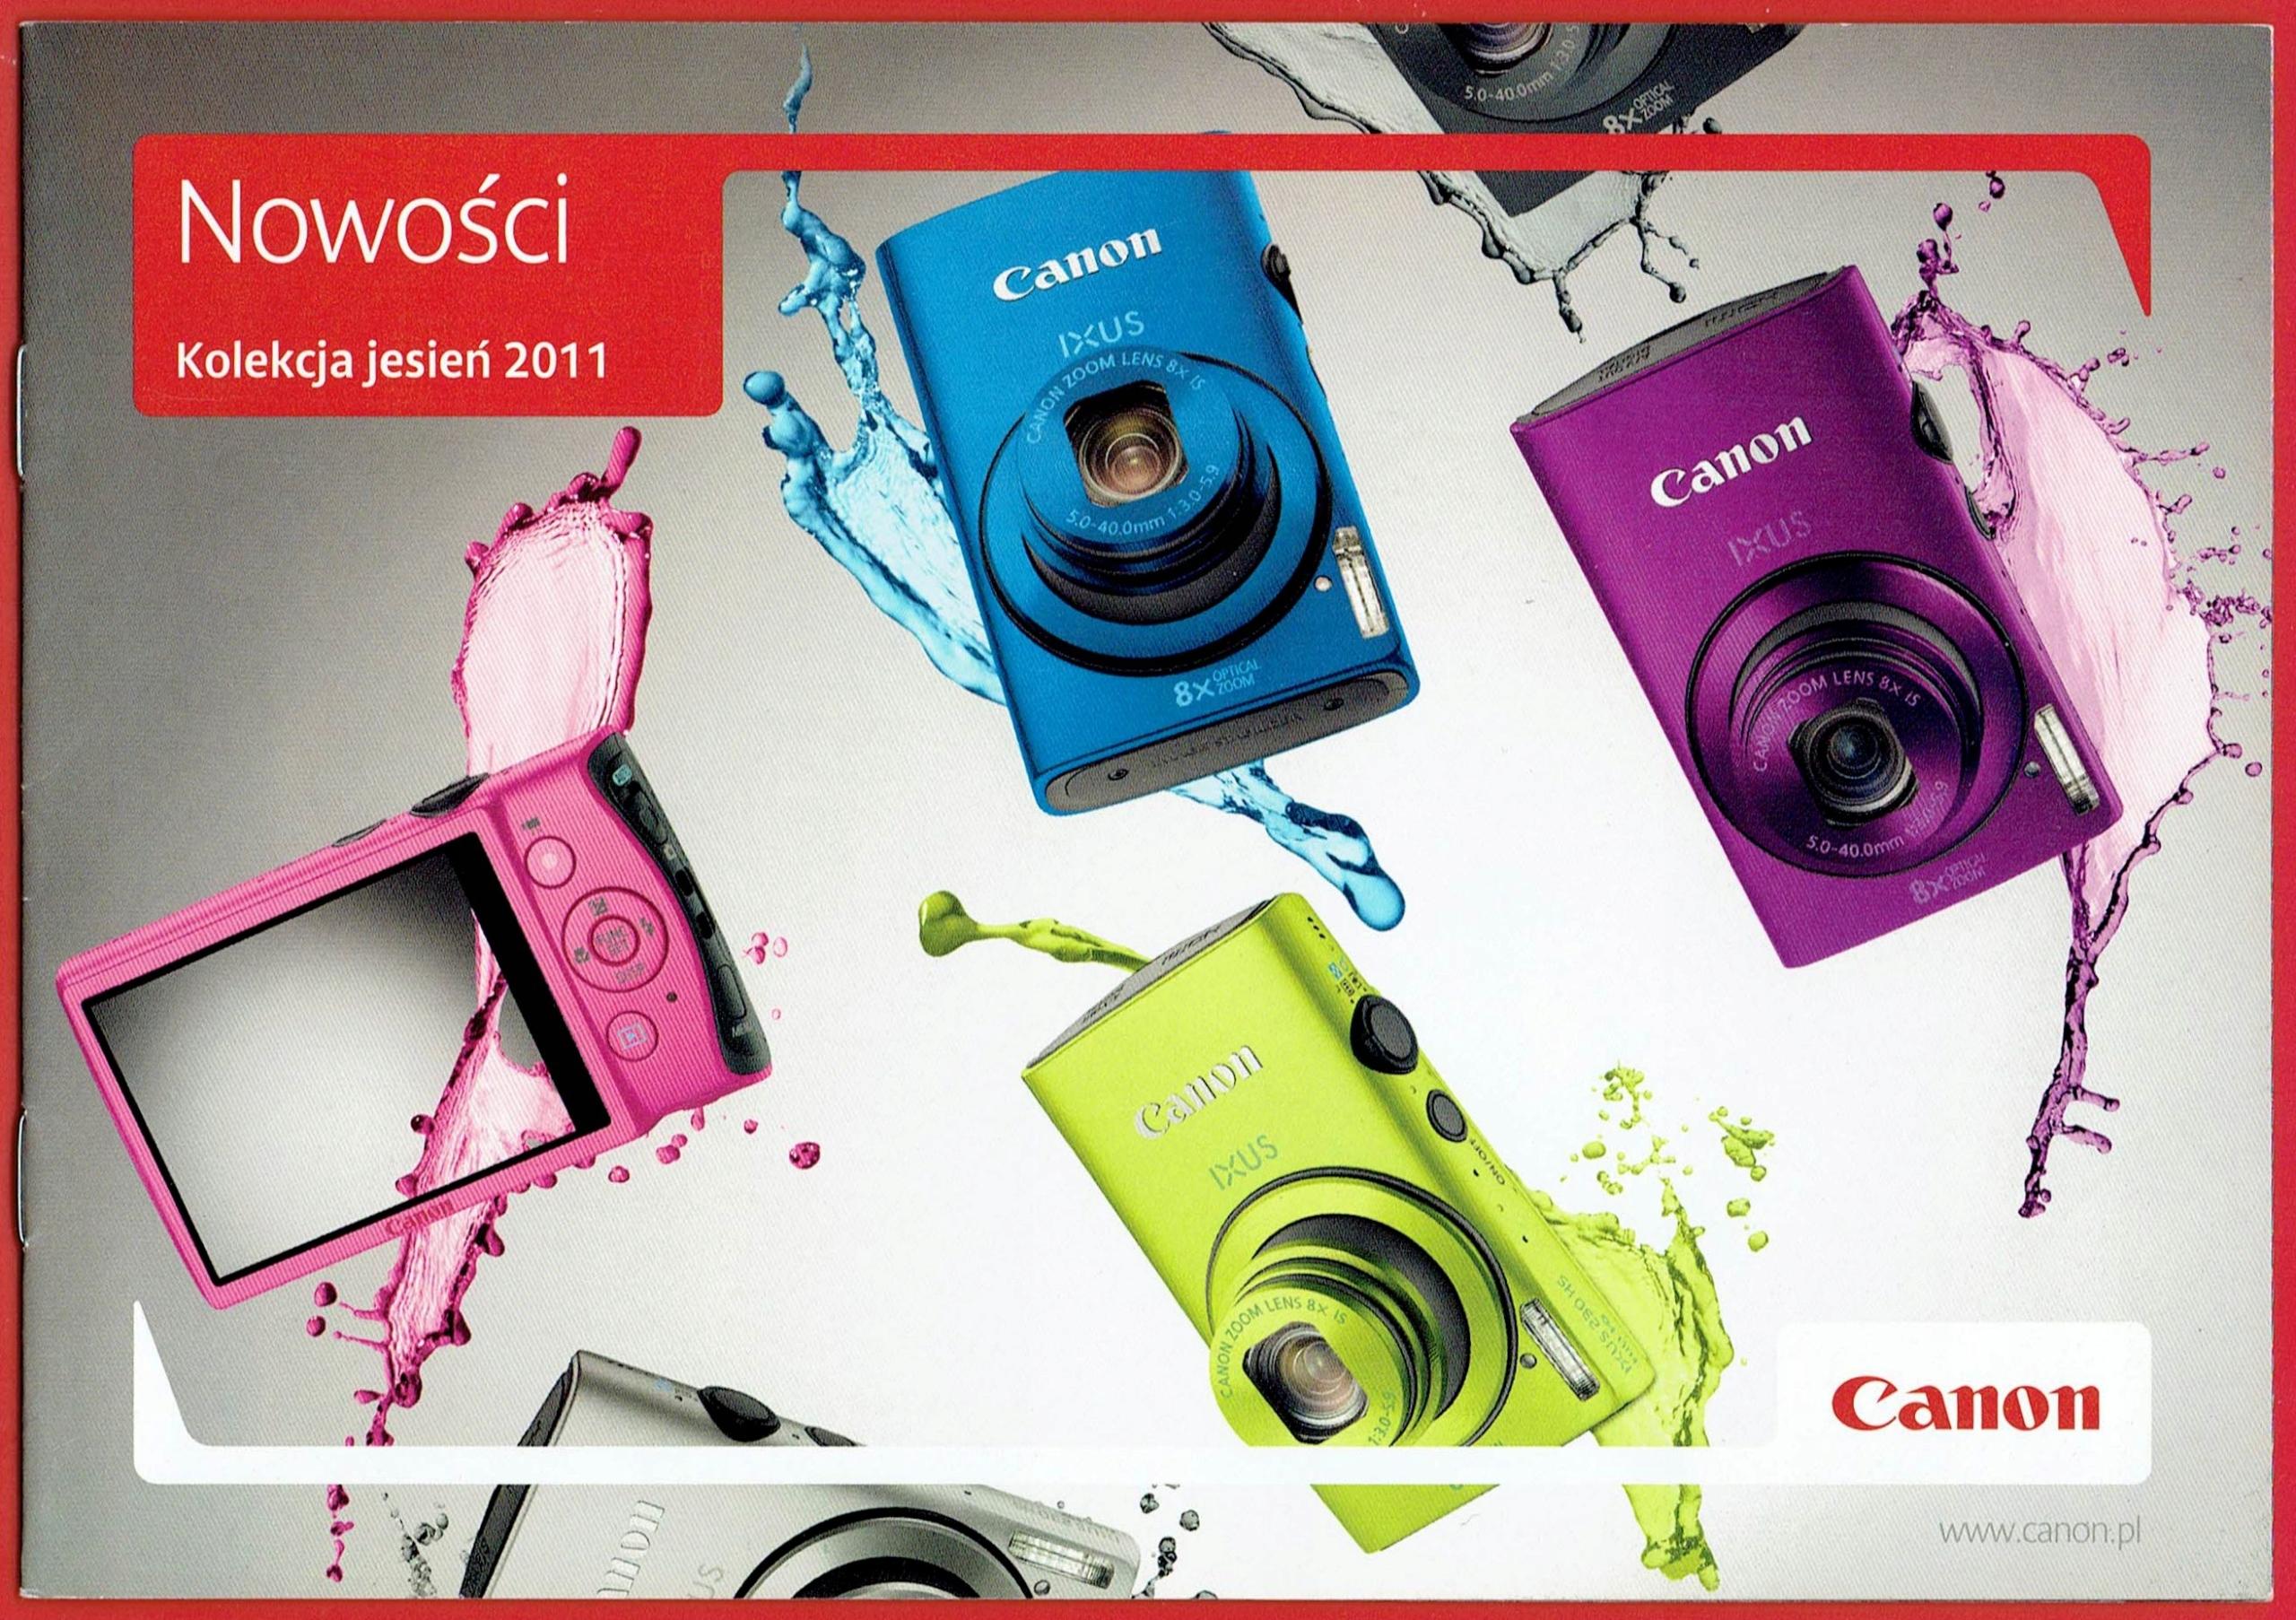 Canon aparaty - folder / katalog 2011 rok